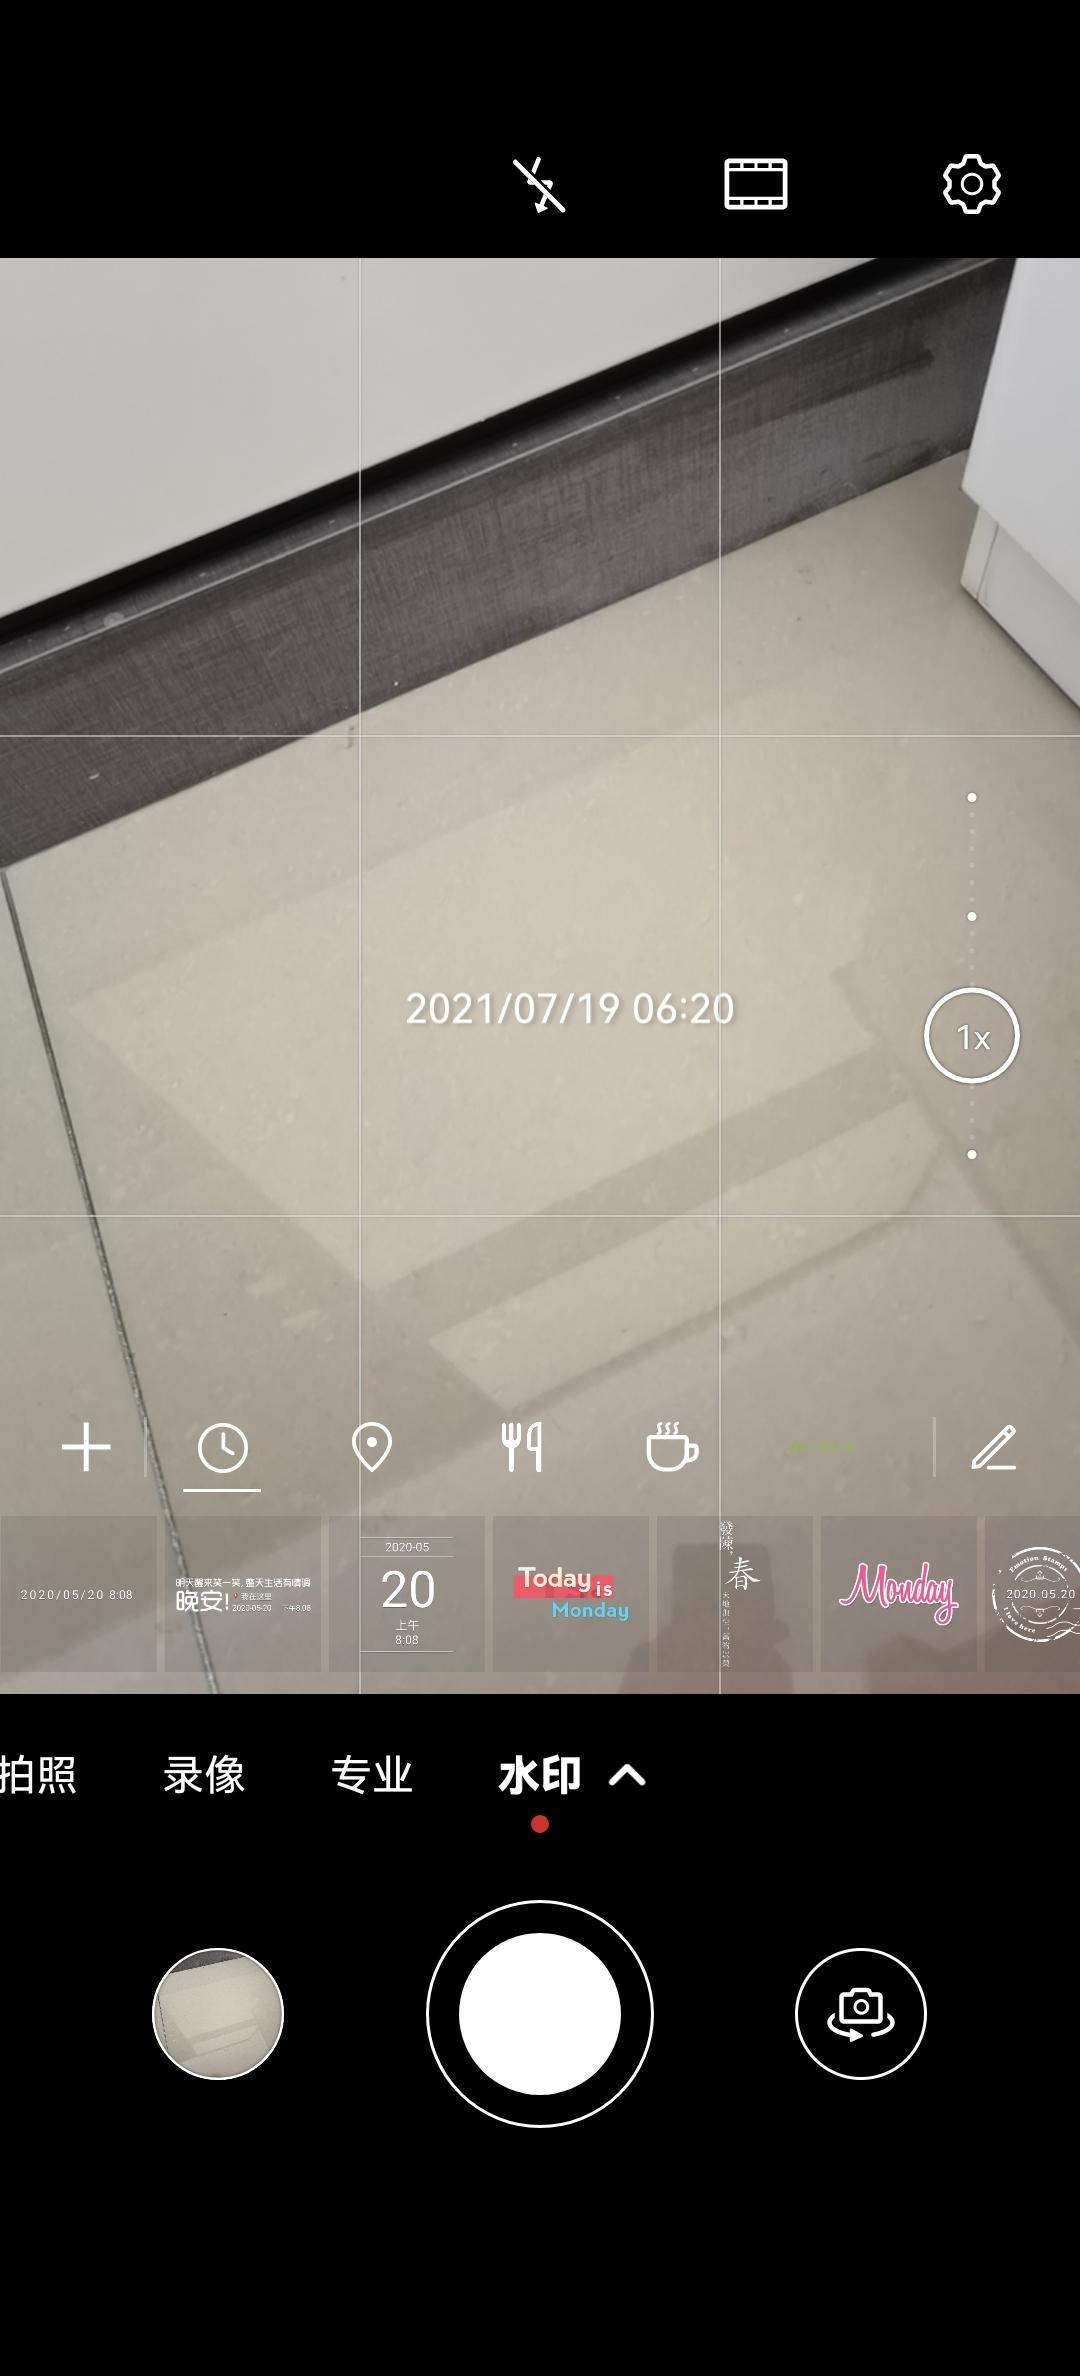 Screenshot_20210719_062011_com.huawei.camera.jpg